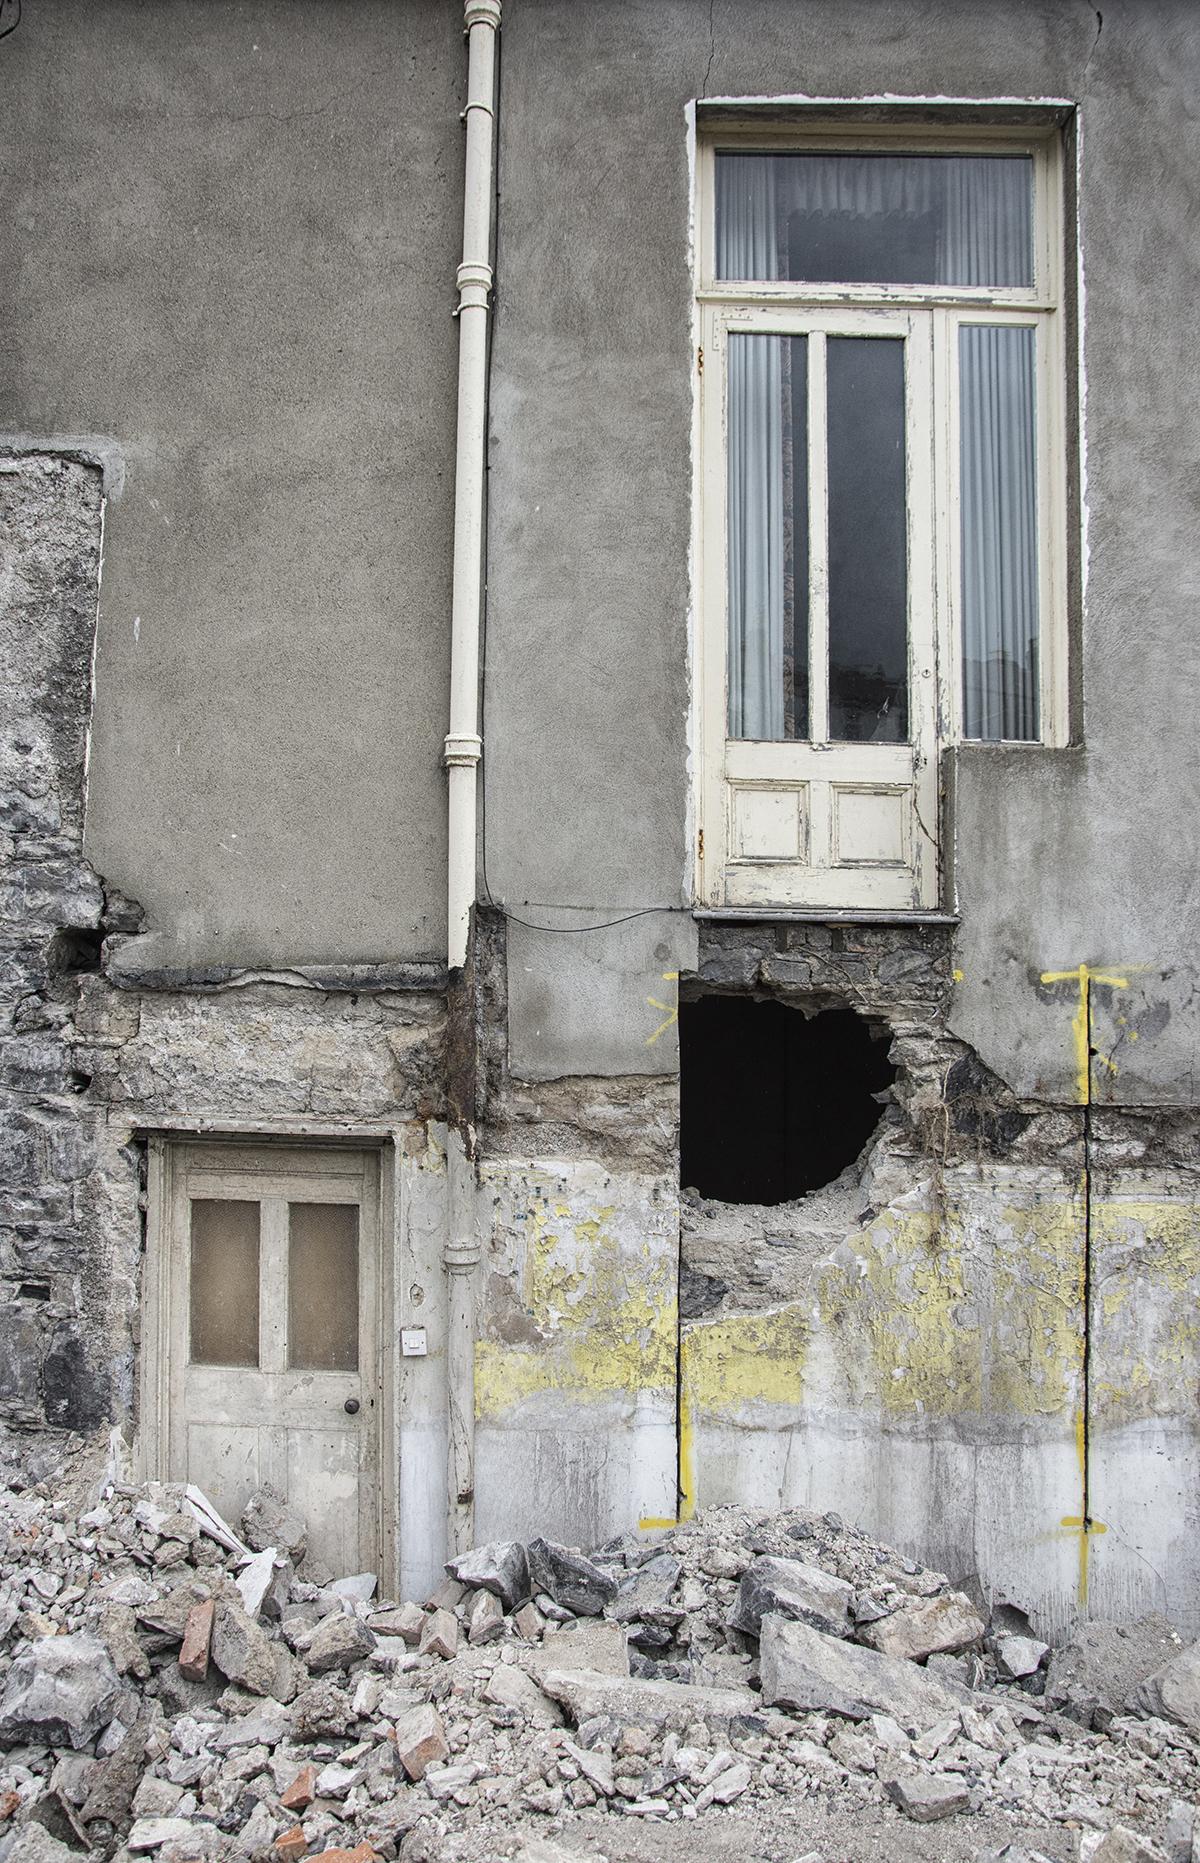 Rathmines Demolition External 1.jpg